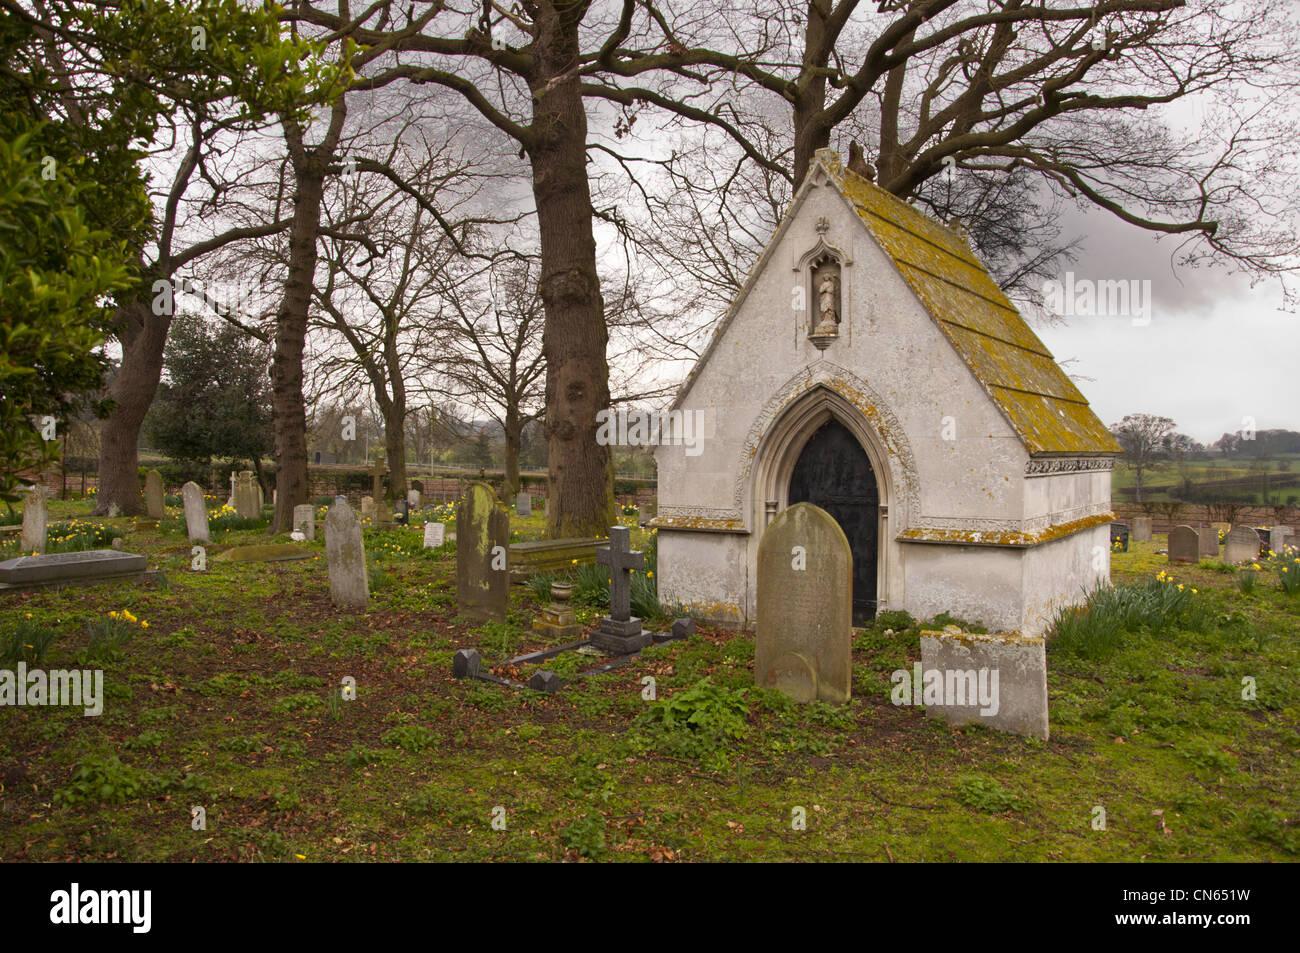 Mausoleum  of Sir Robert John Harvey  in Kirby Bedon country church yard graveyard - Stock Image